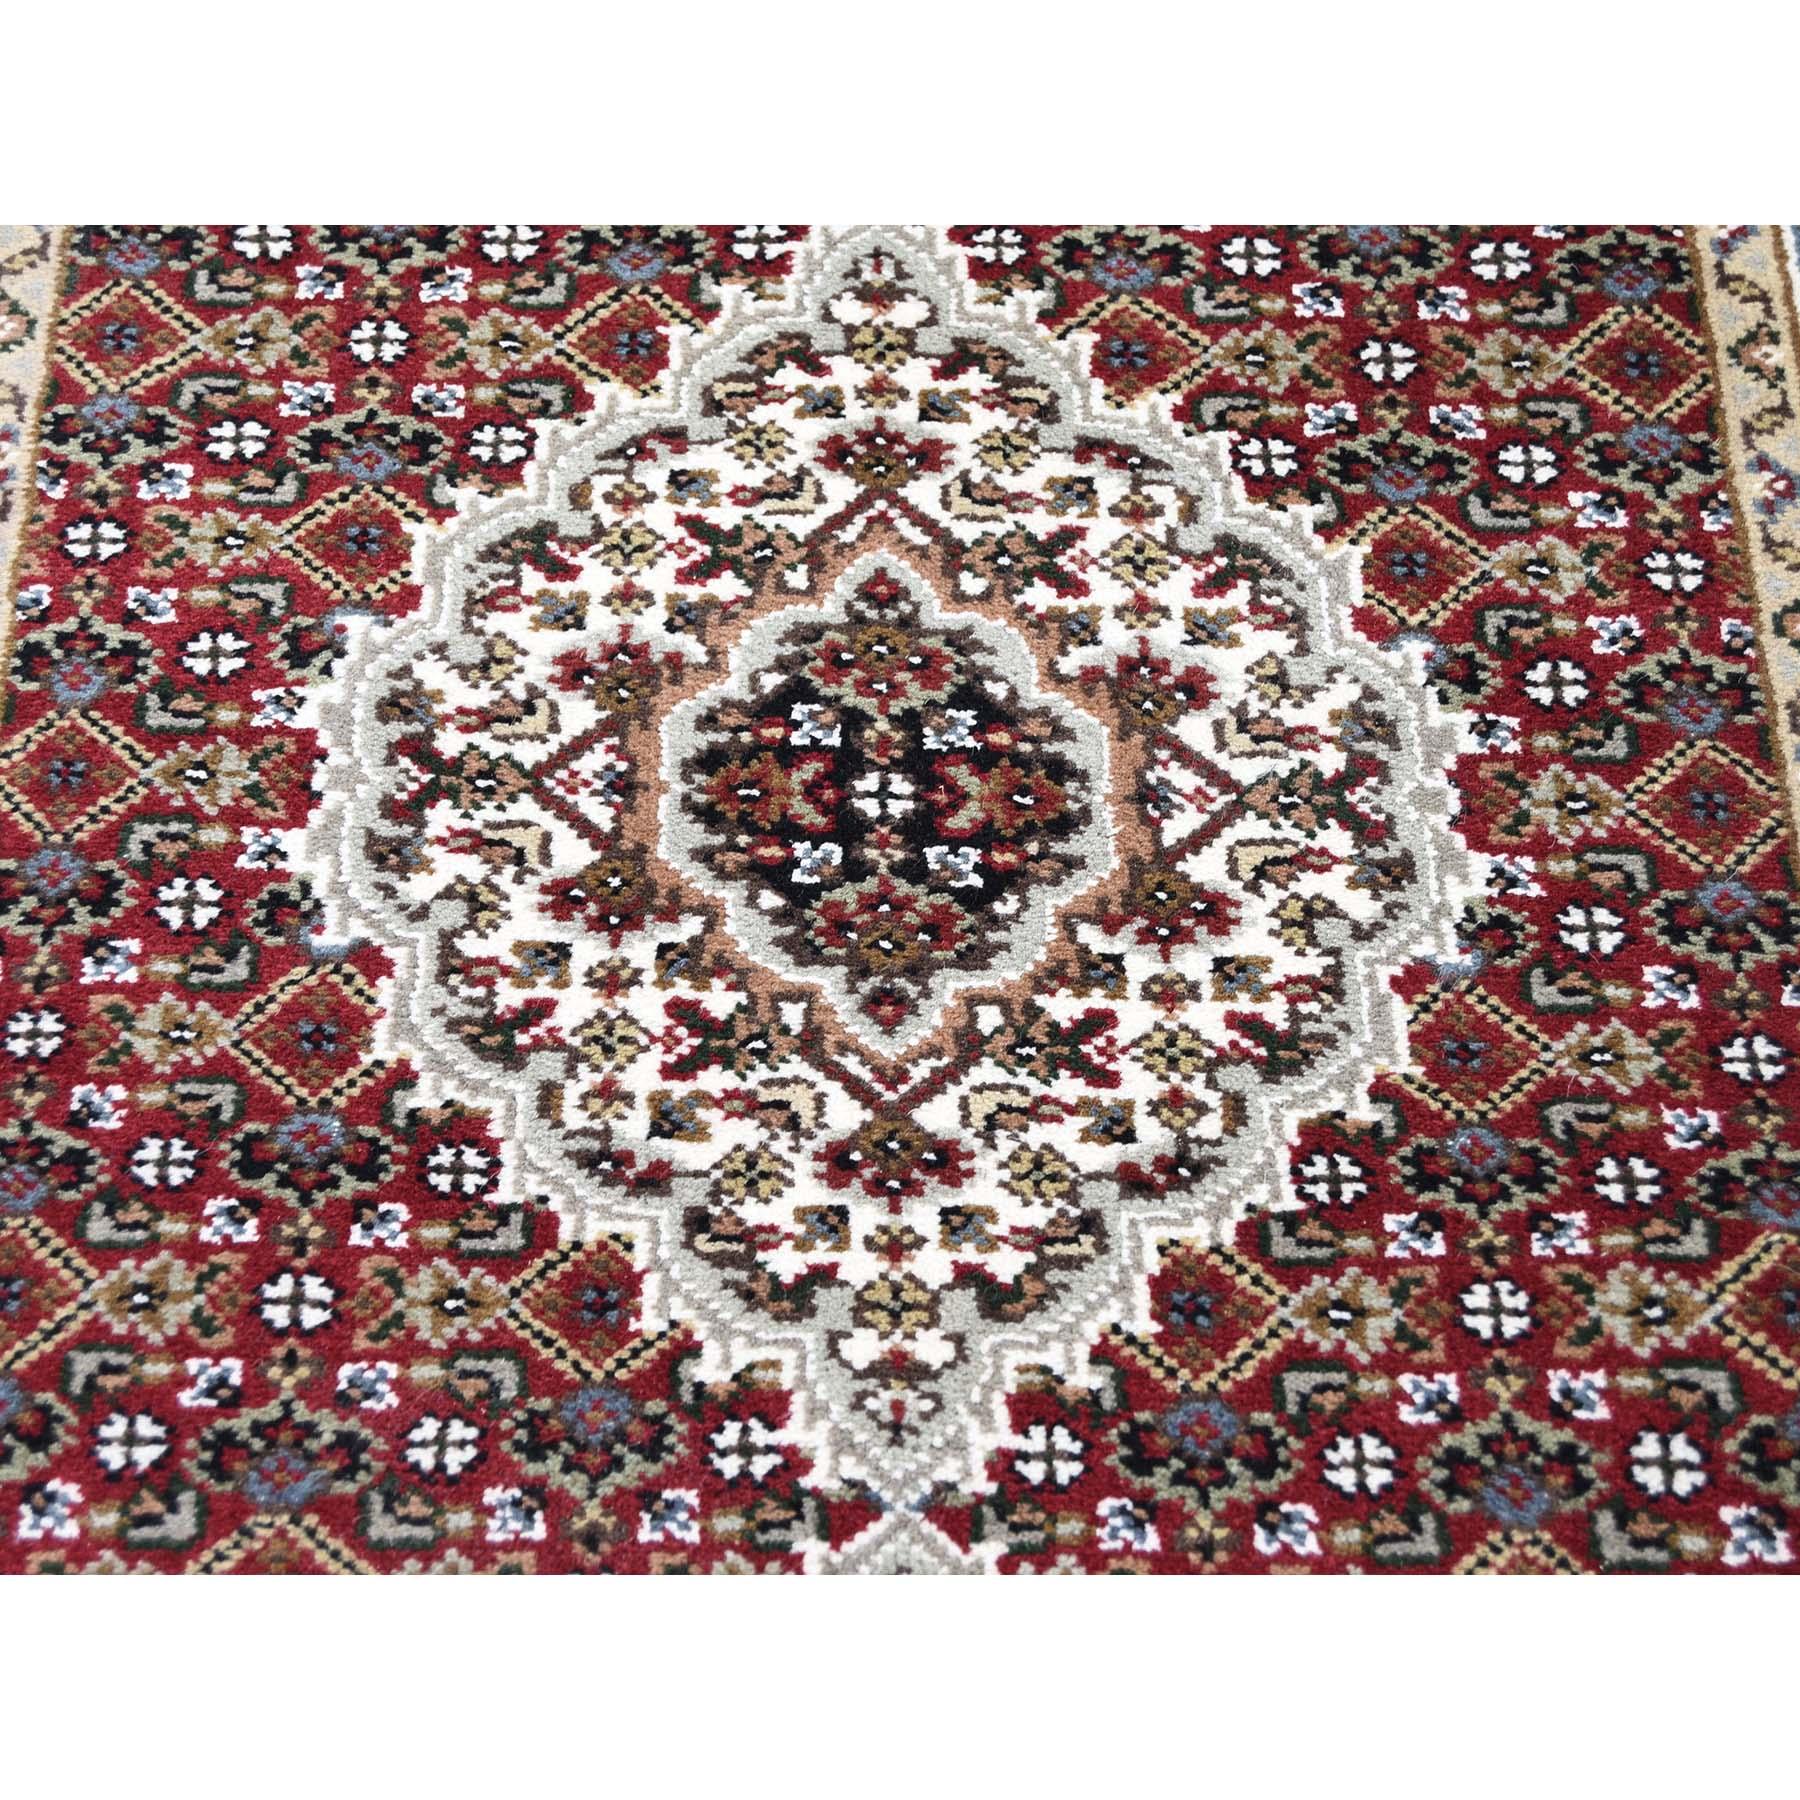 2-7 x23-7   Wool and Silk Tabriz Mahi Hand-Knotted XL Runner Rug